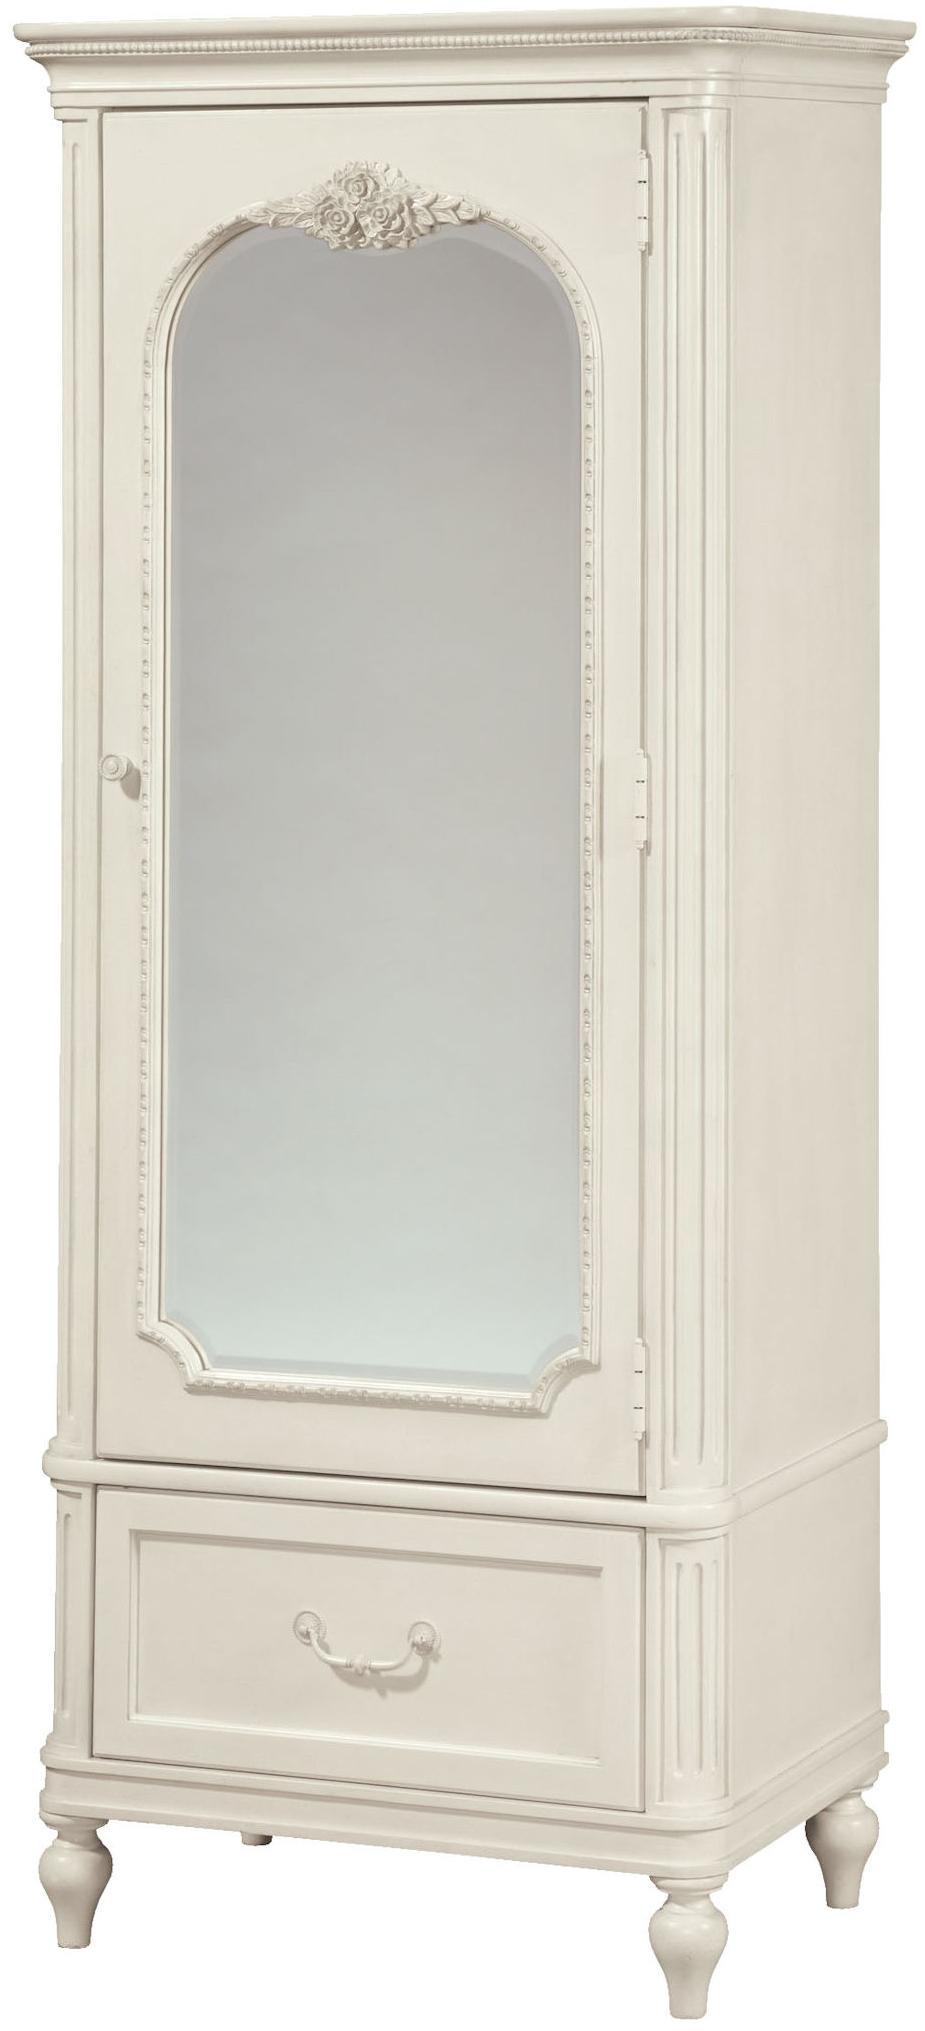 Perfect Smartstuff Gabriella Mirrored One Door Armoire With Cork Board U0026 Variety Of  Storage Spaces